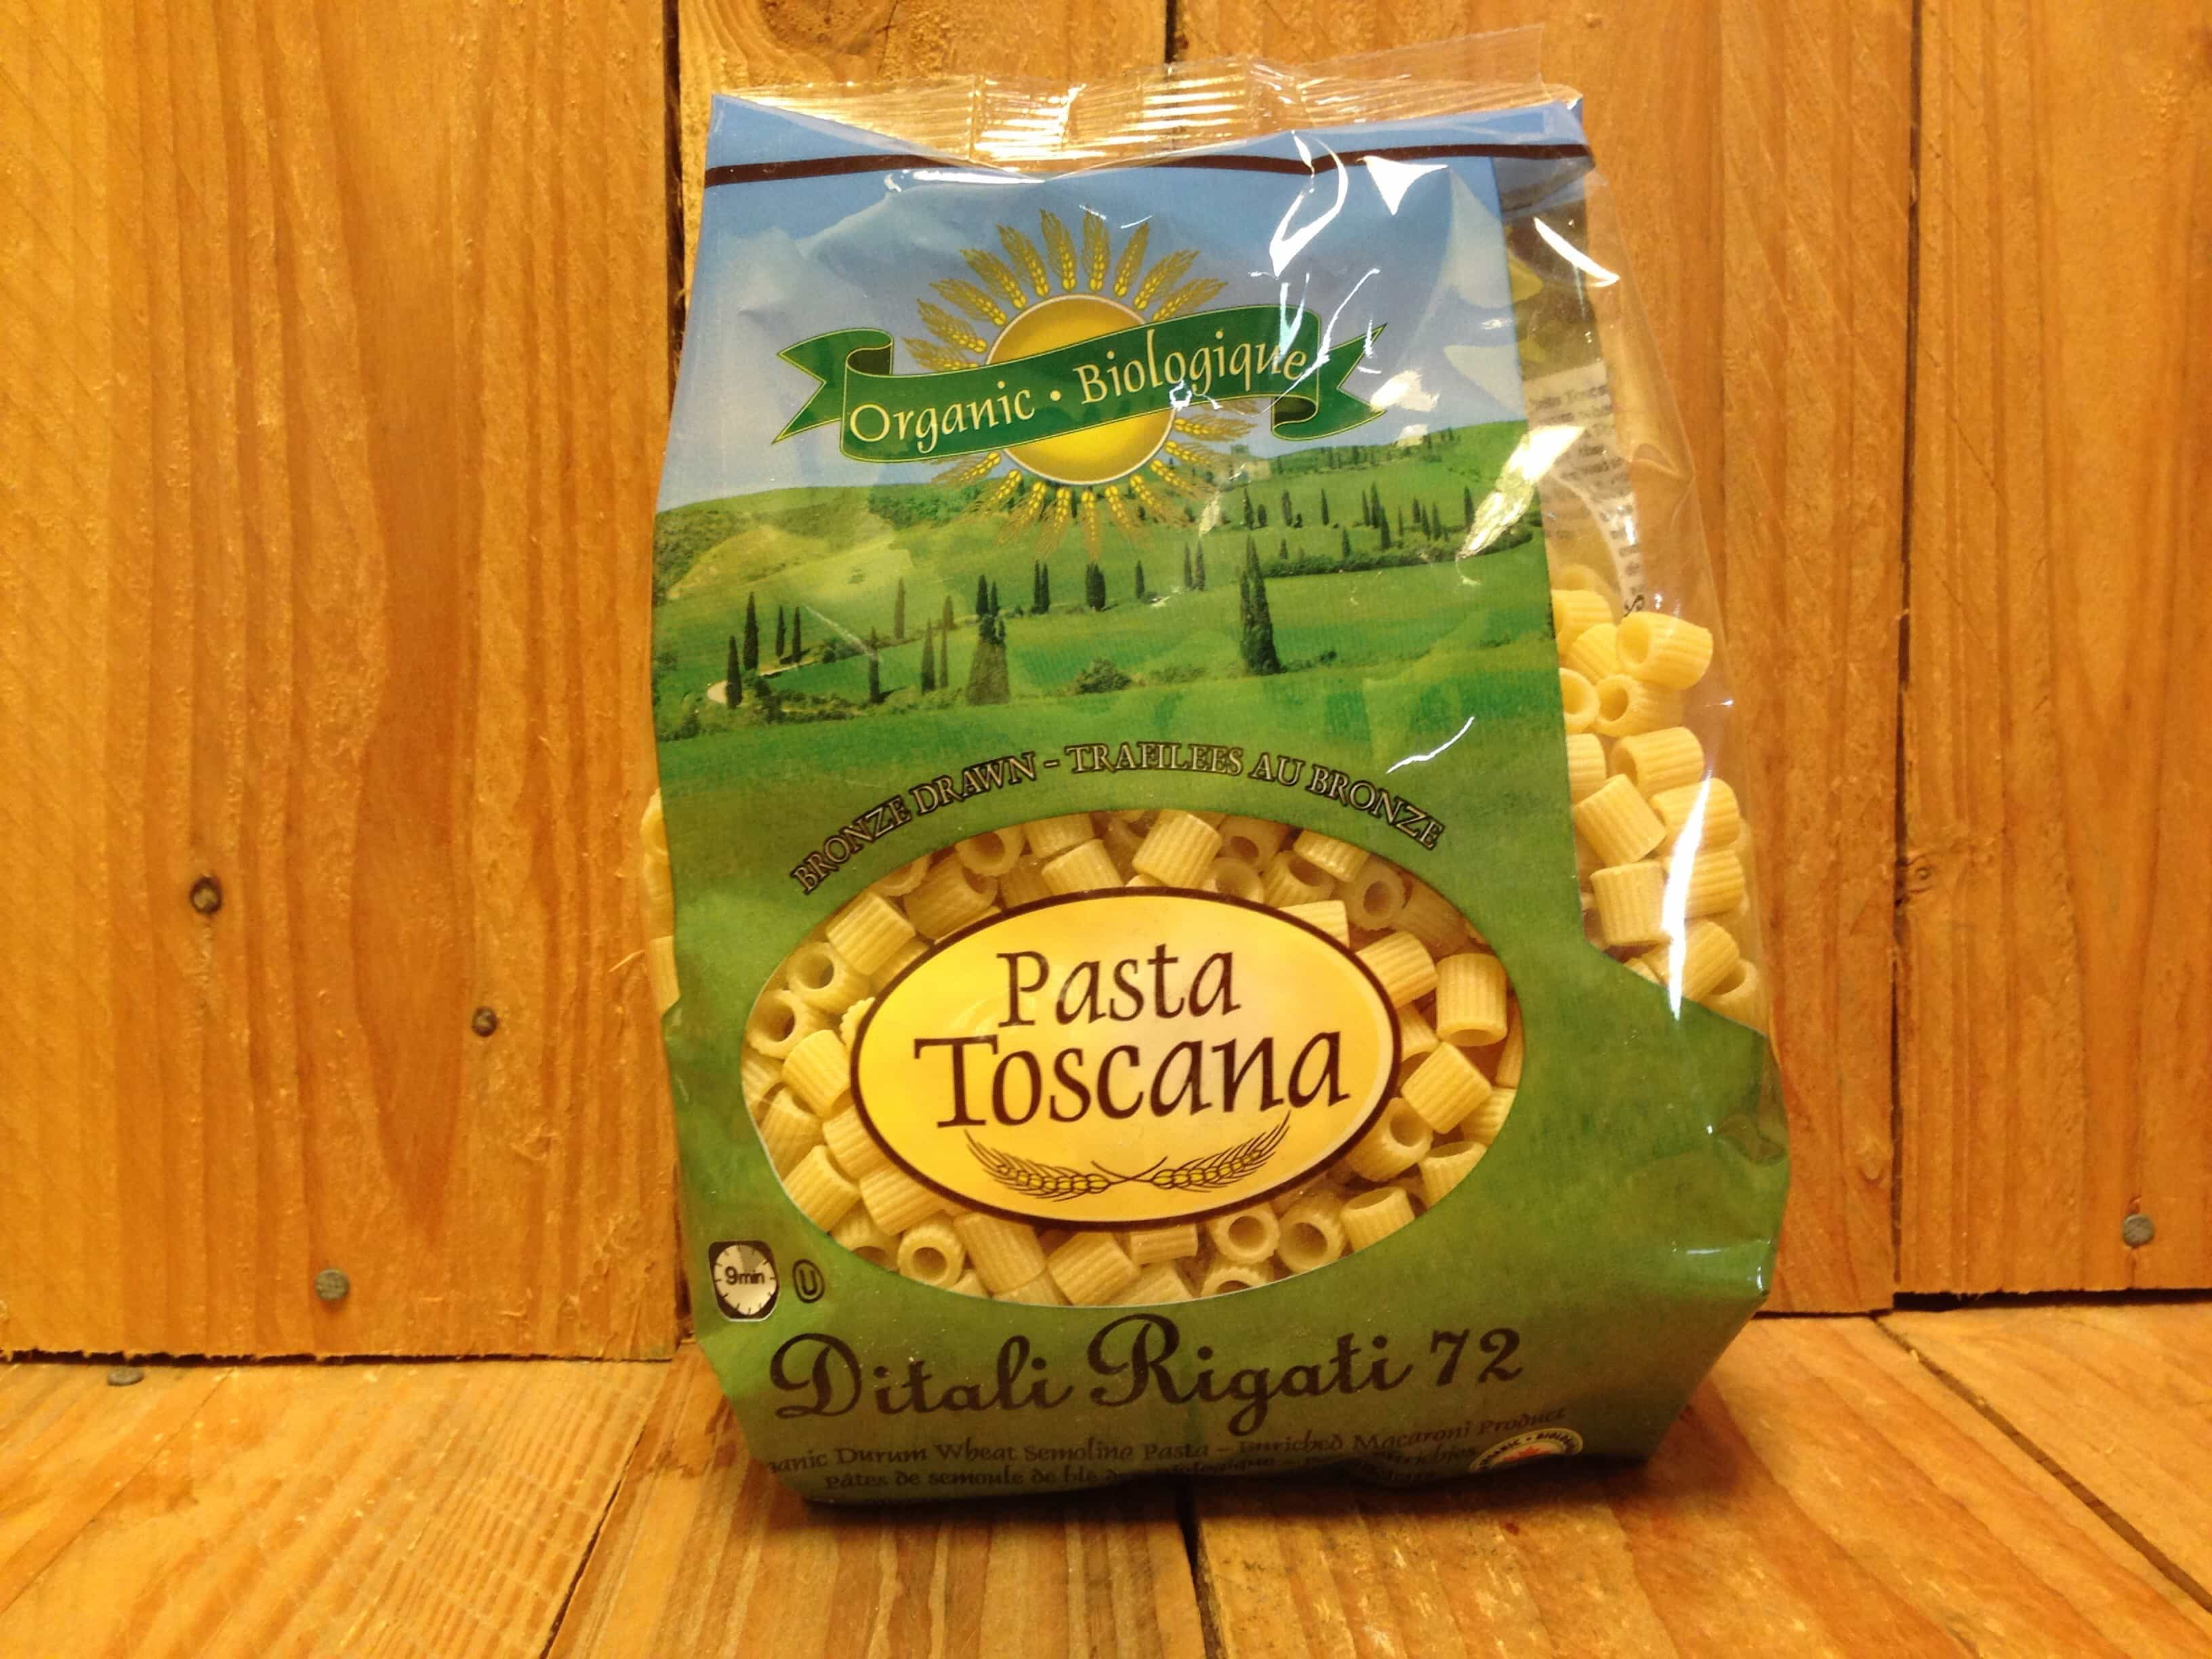 Pasta Toscana – Ditali (500g)